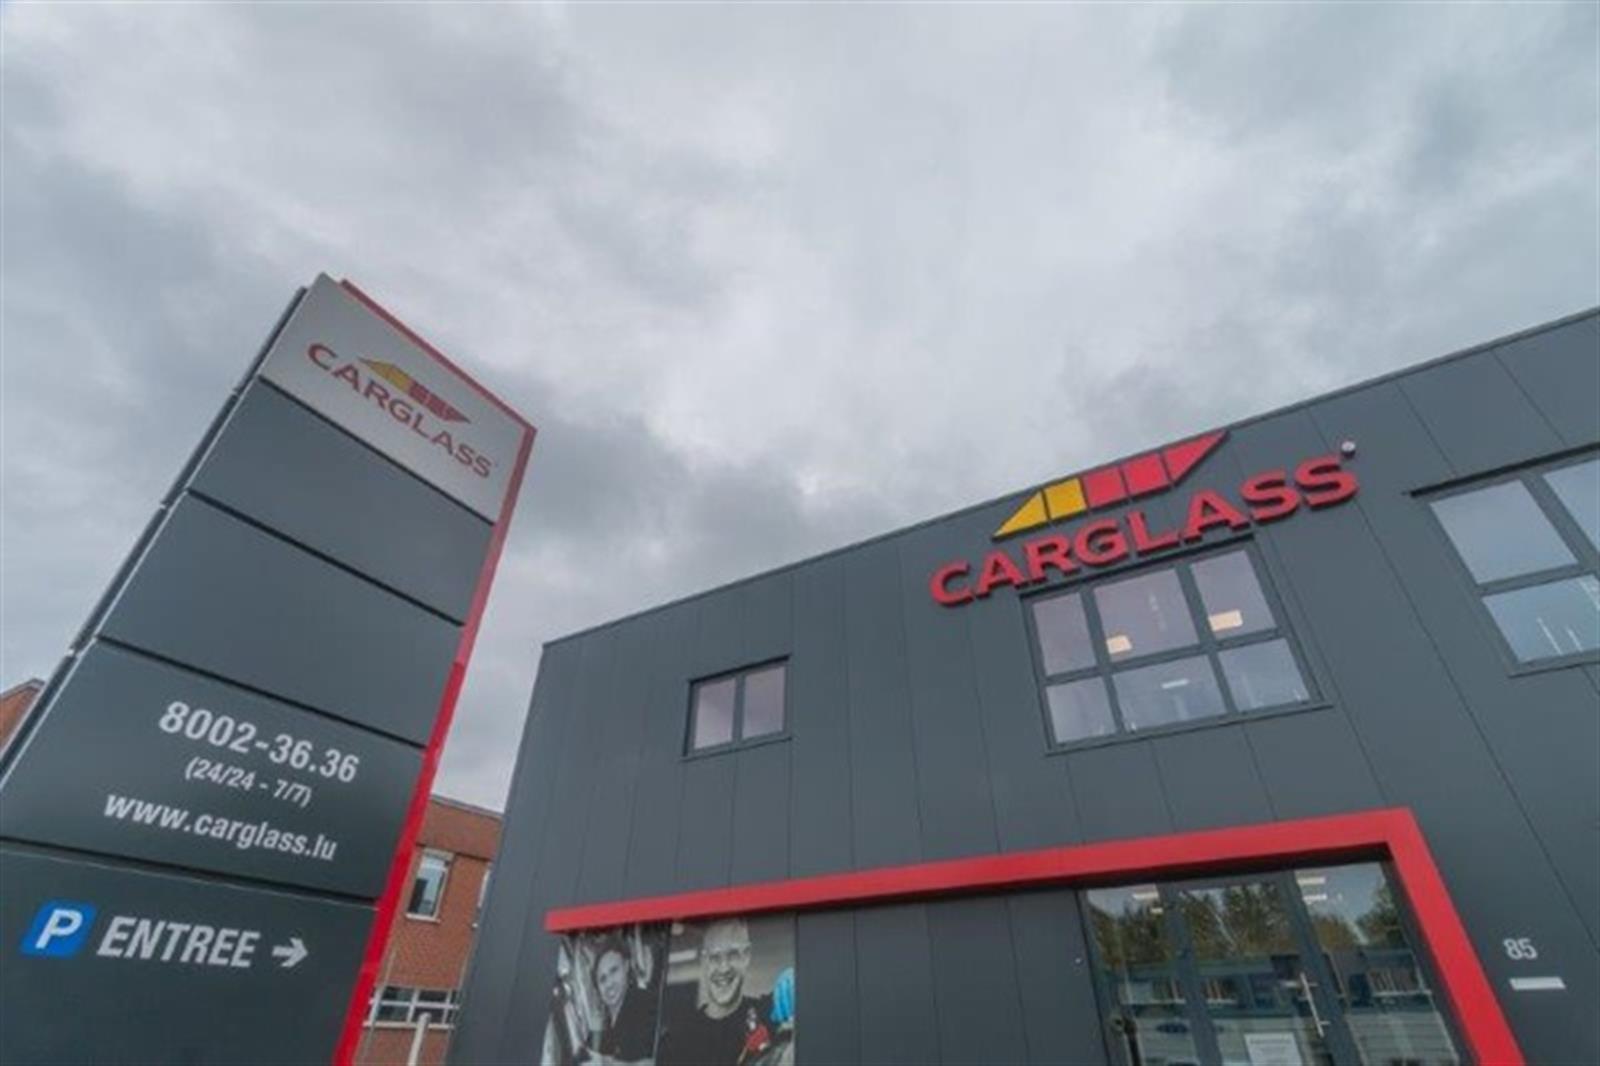 carglass luxembourg windshield repair motor vehicle equipment editus. Black Bedroom Furniture Sets. Home Design Ideas